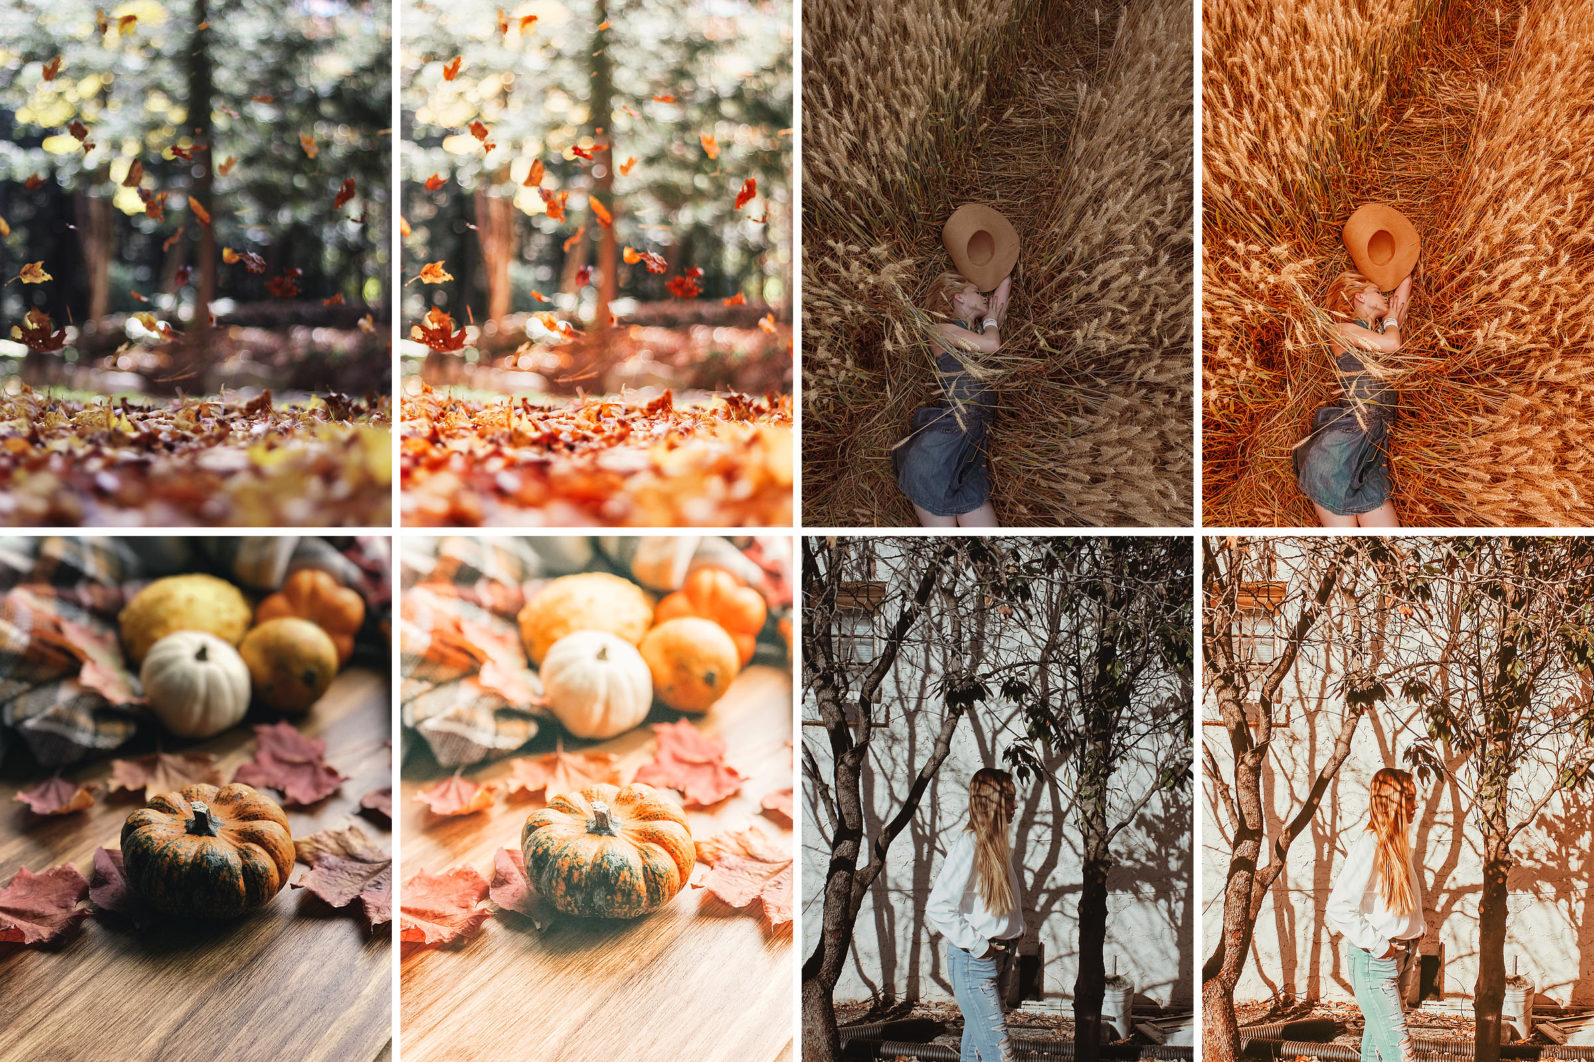 19. Winter & Fall - 19.WINTERFALL 04 -